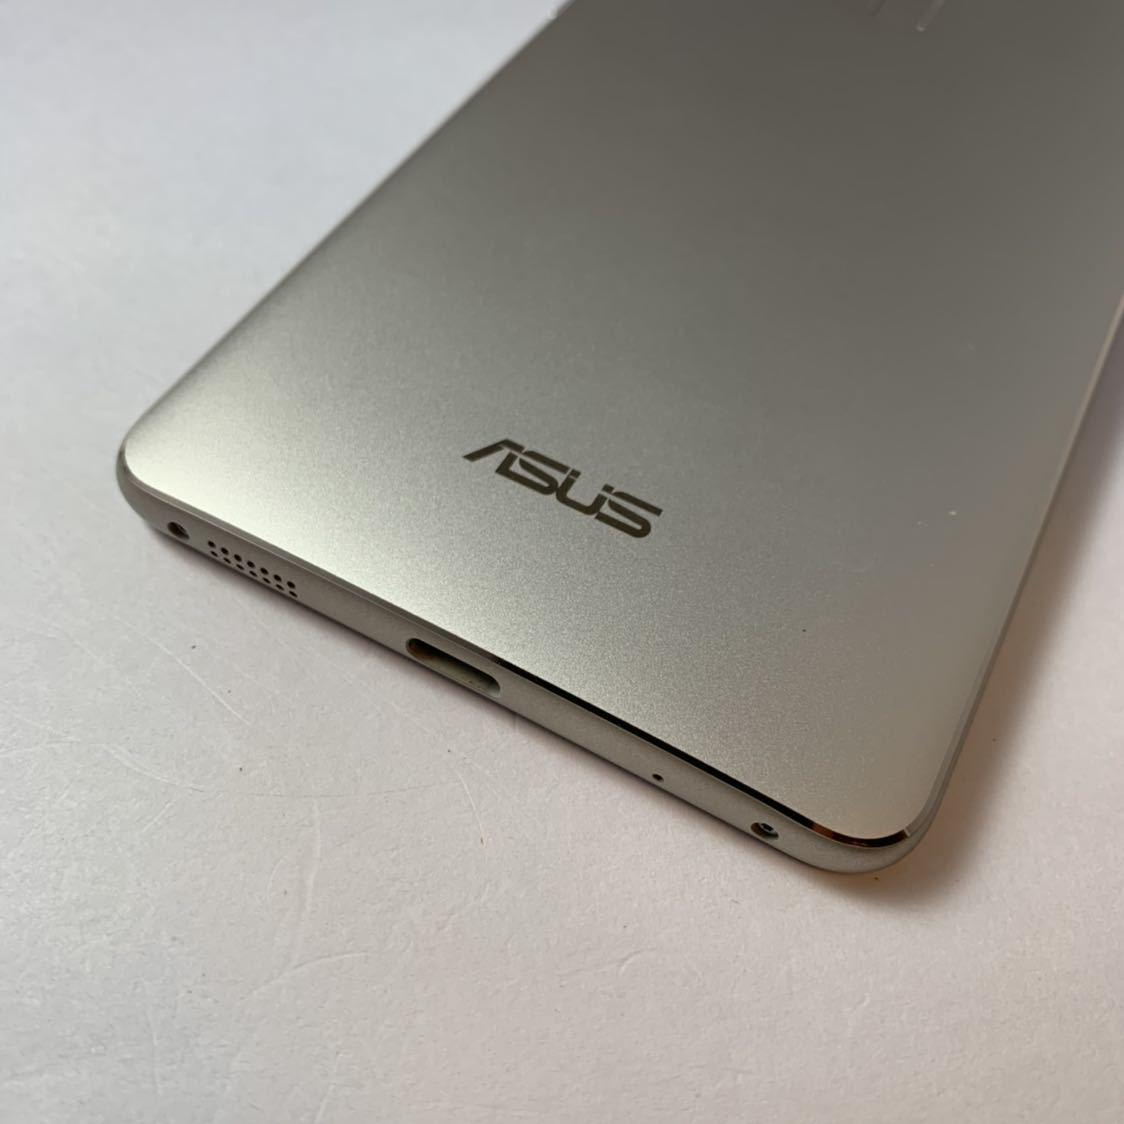 ASUS Zenfone 3 Deluxe 5.5 ZS550KL 64GB SIMフリー 本体 Z01FD ゴールド 海外版_画像2